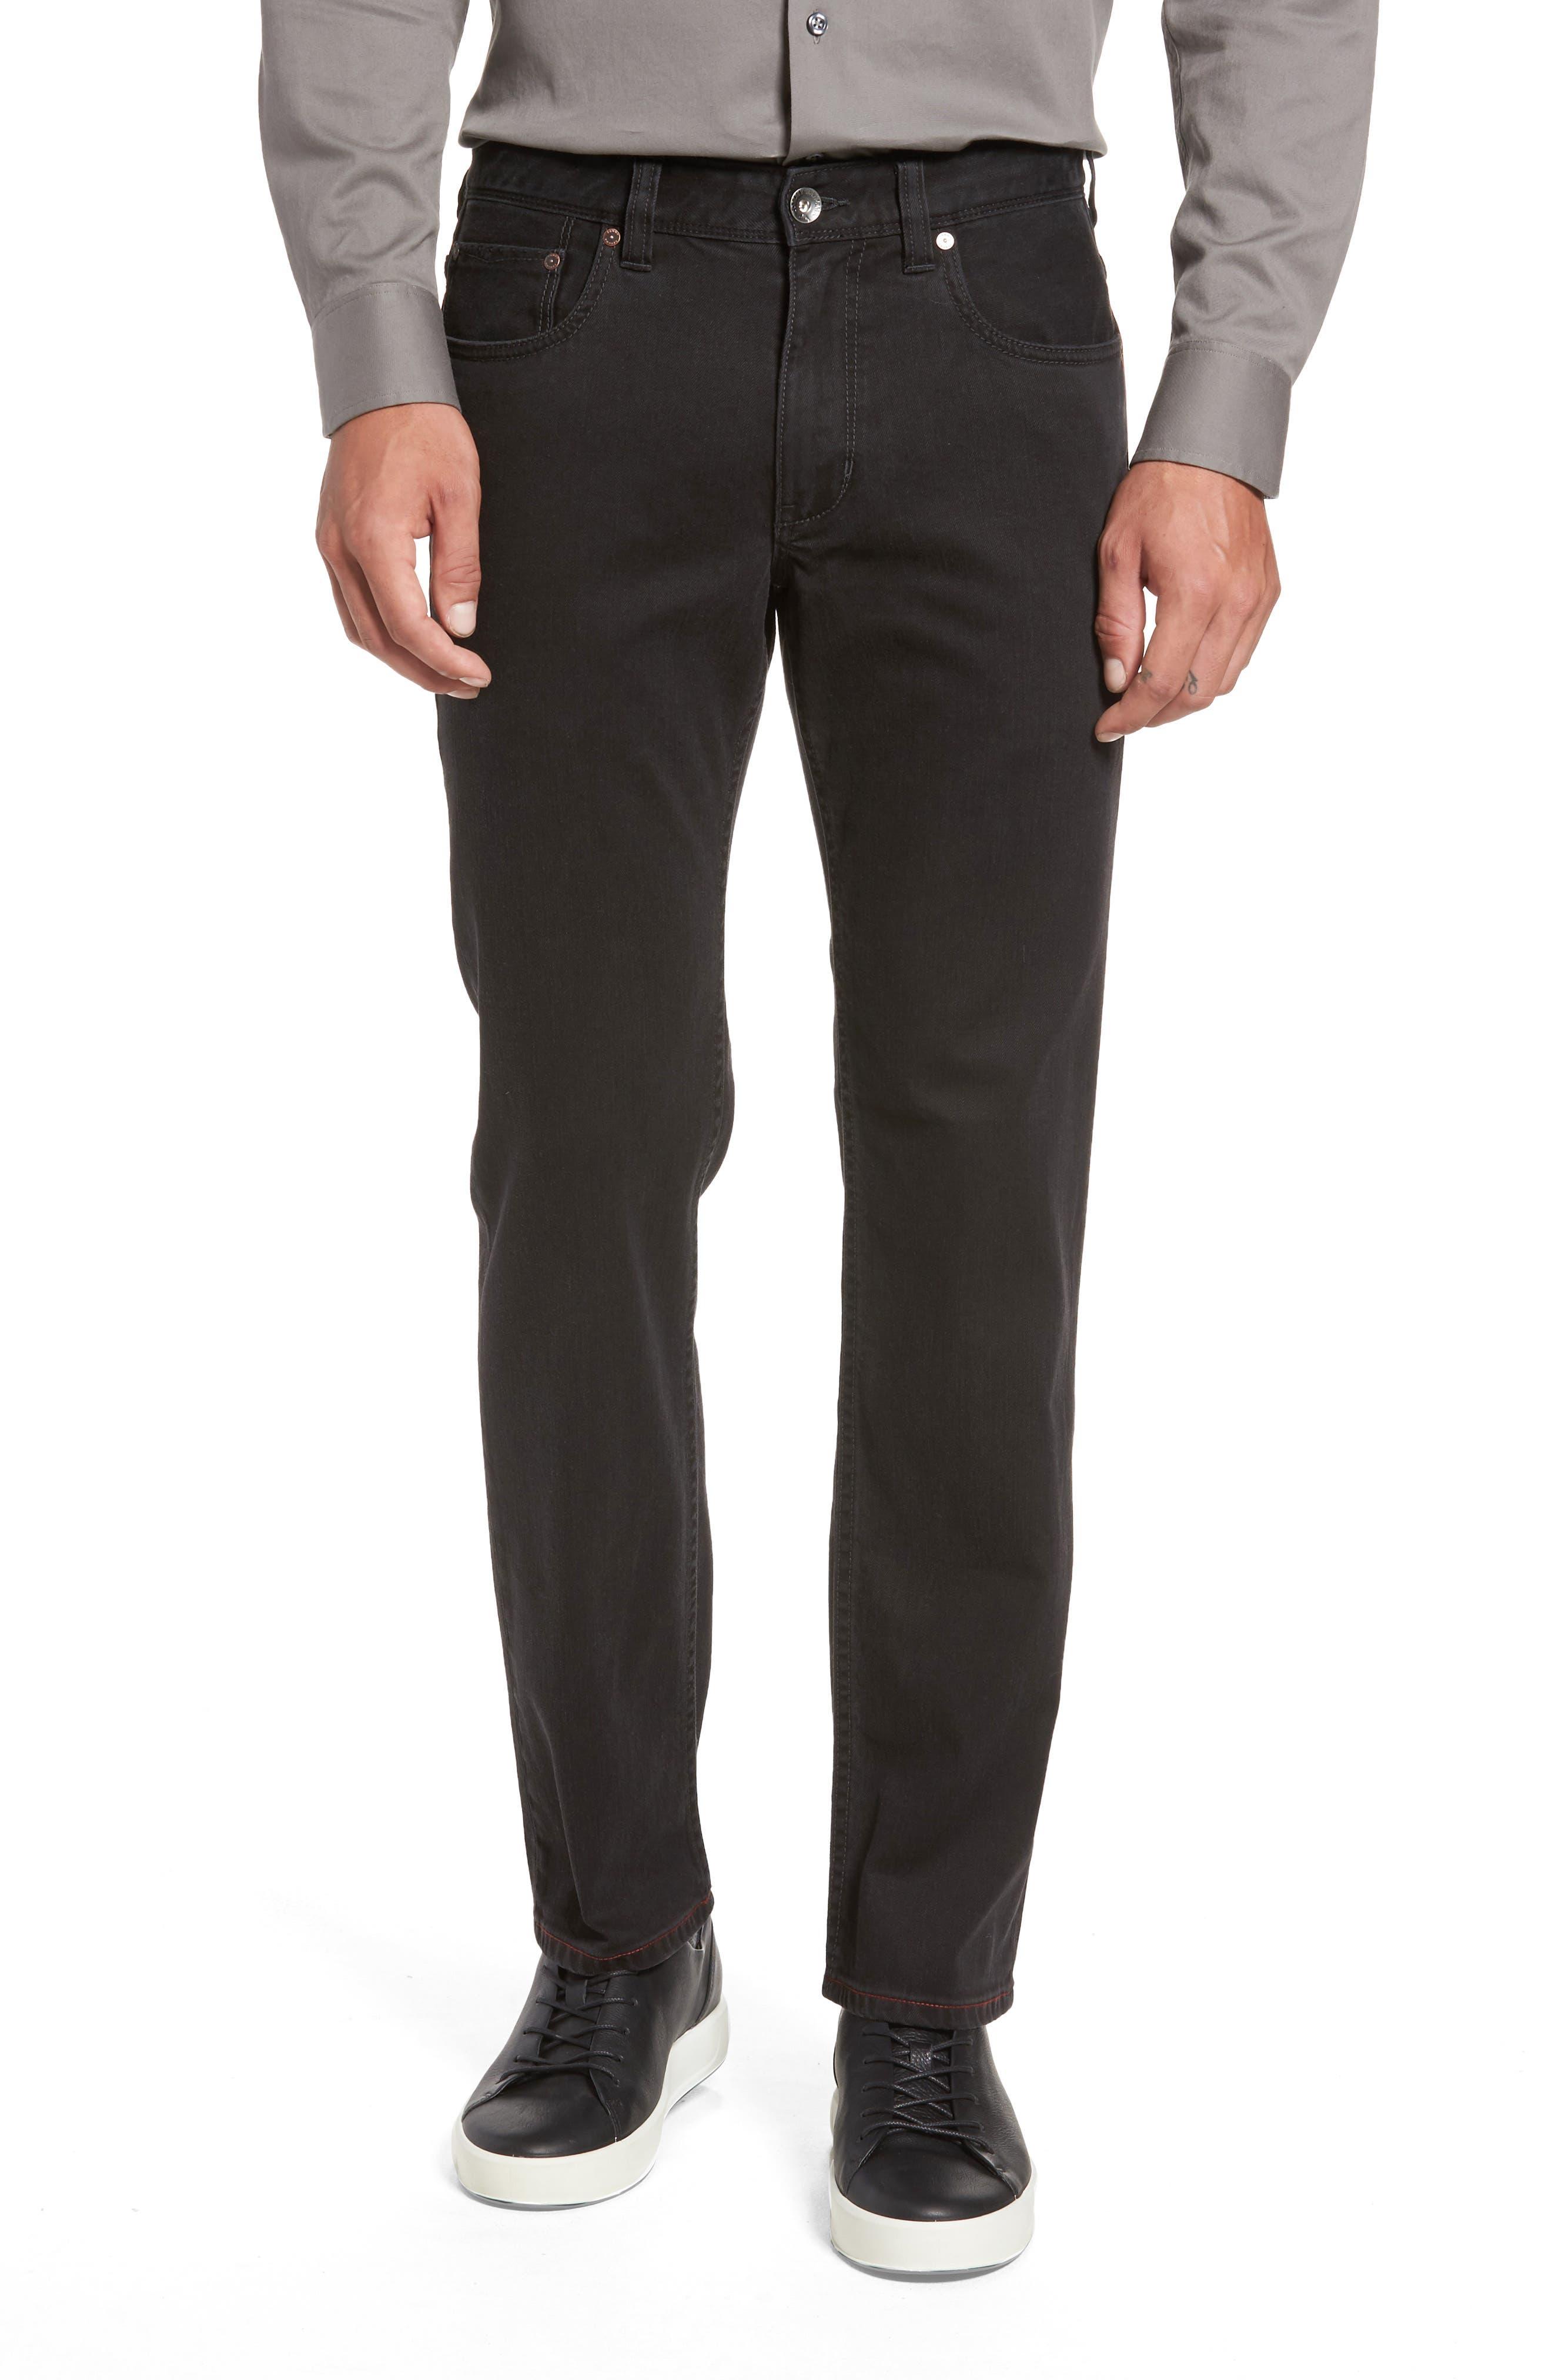 Alternate Image 1 Selected - Tommy Bahama Sand Drifter Straight Leg Jeans